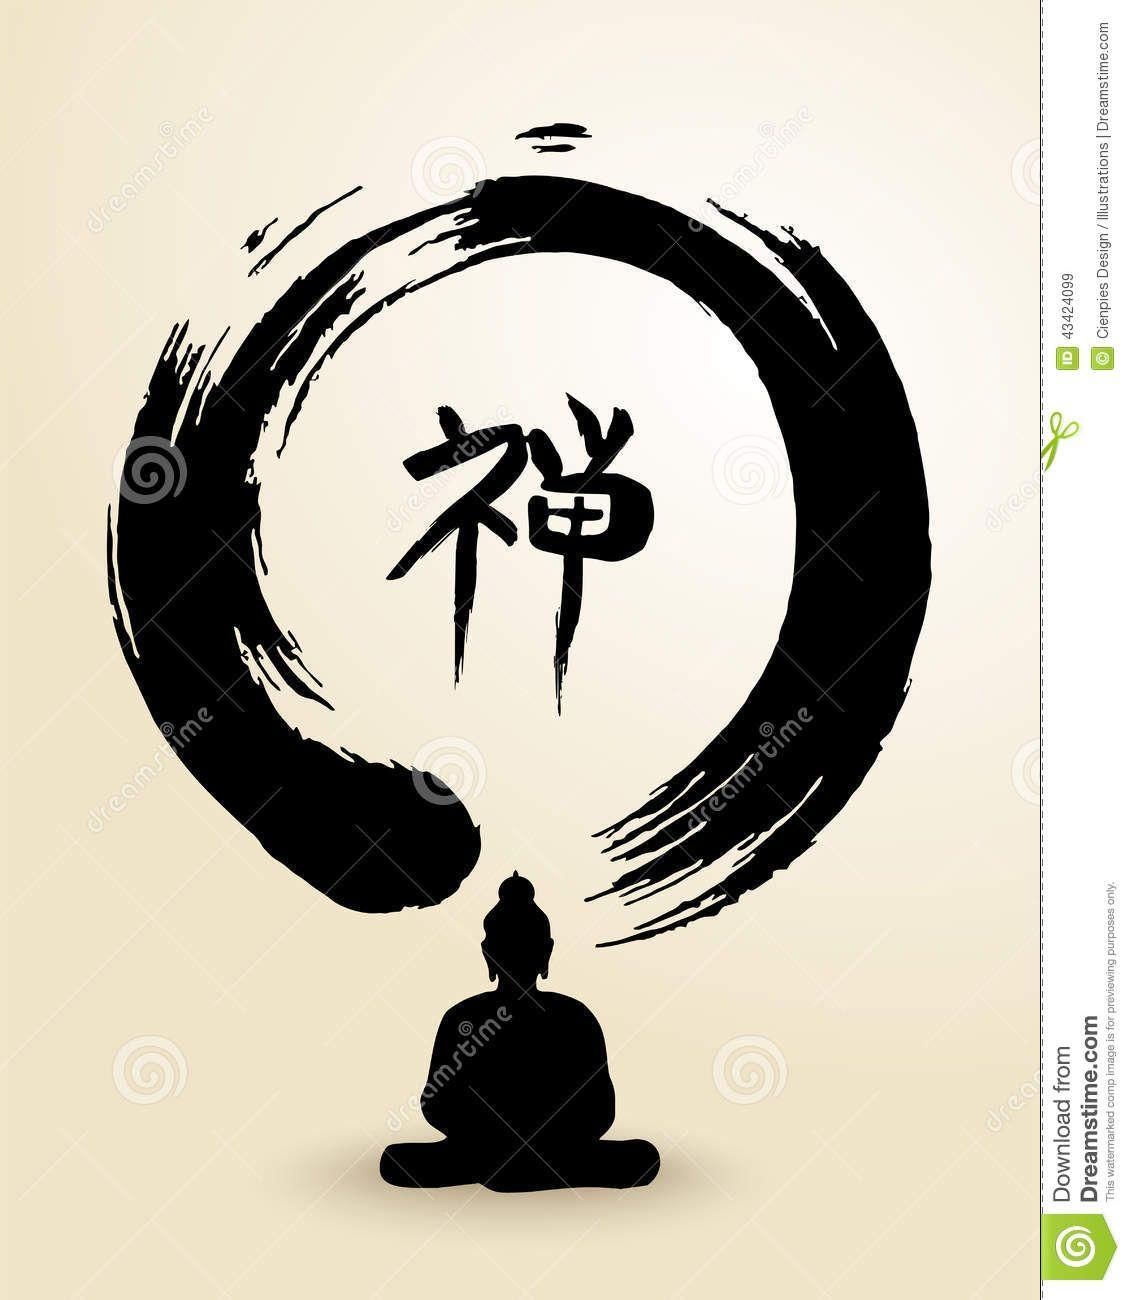 Zen Circle And Buddha Illustration Stock Vector Image 43424099